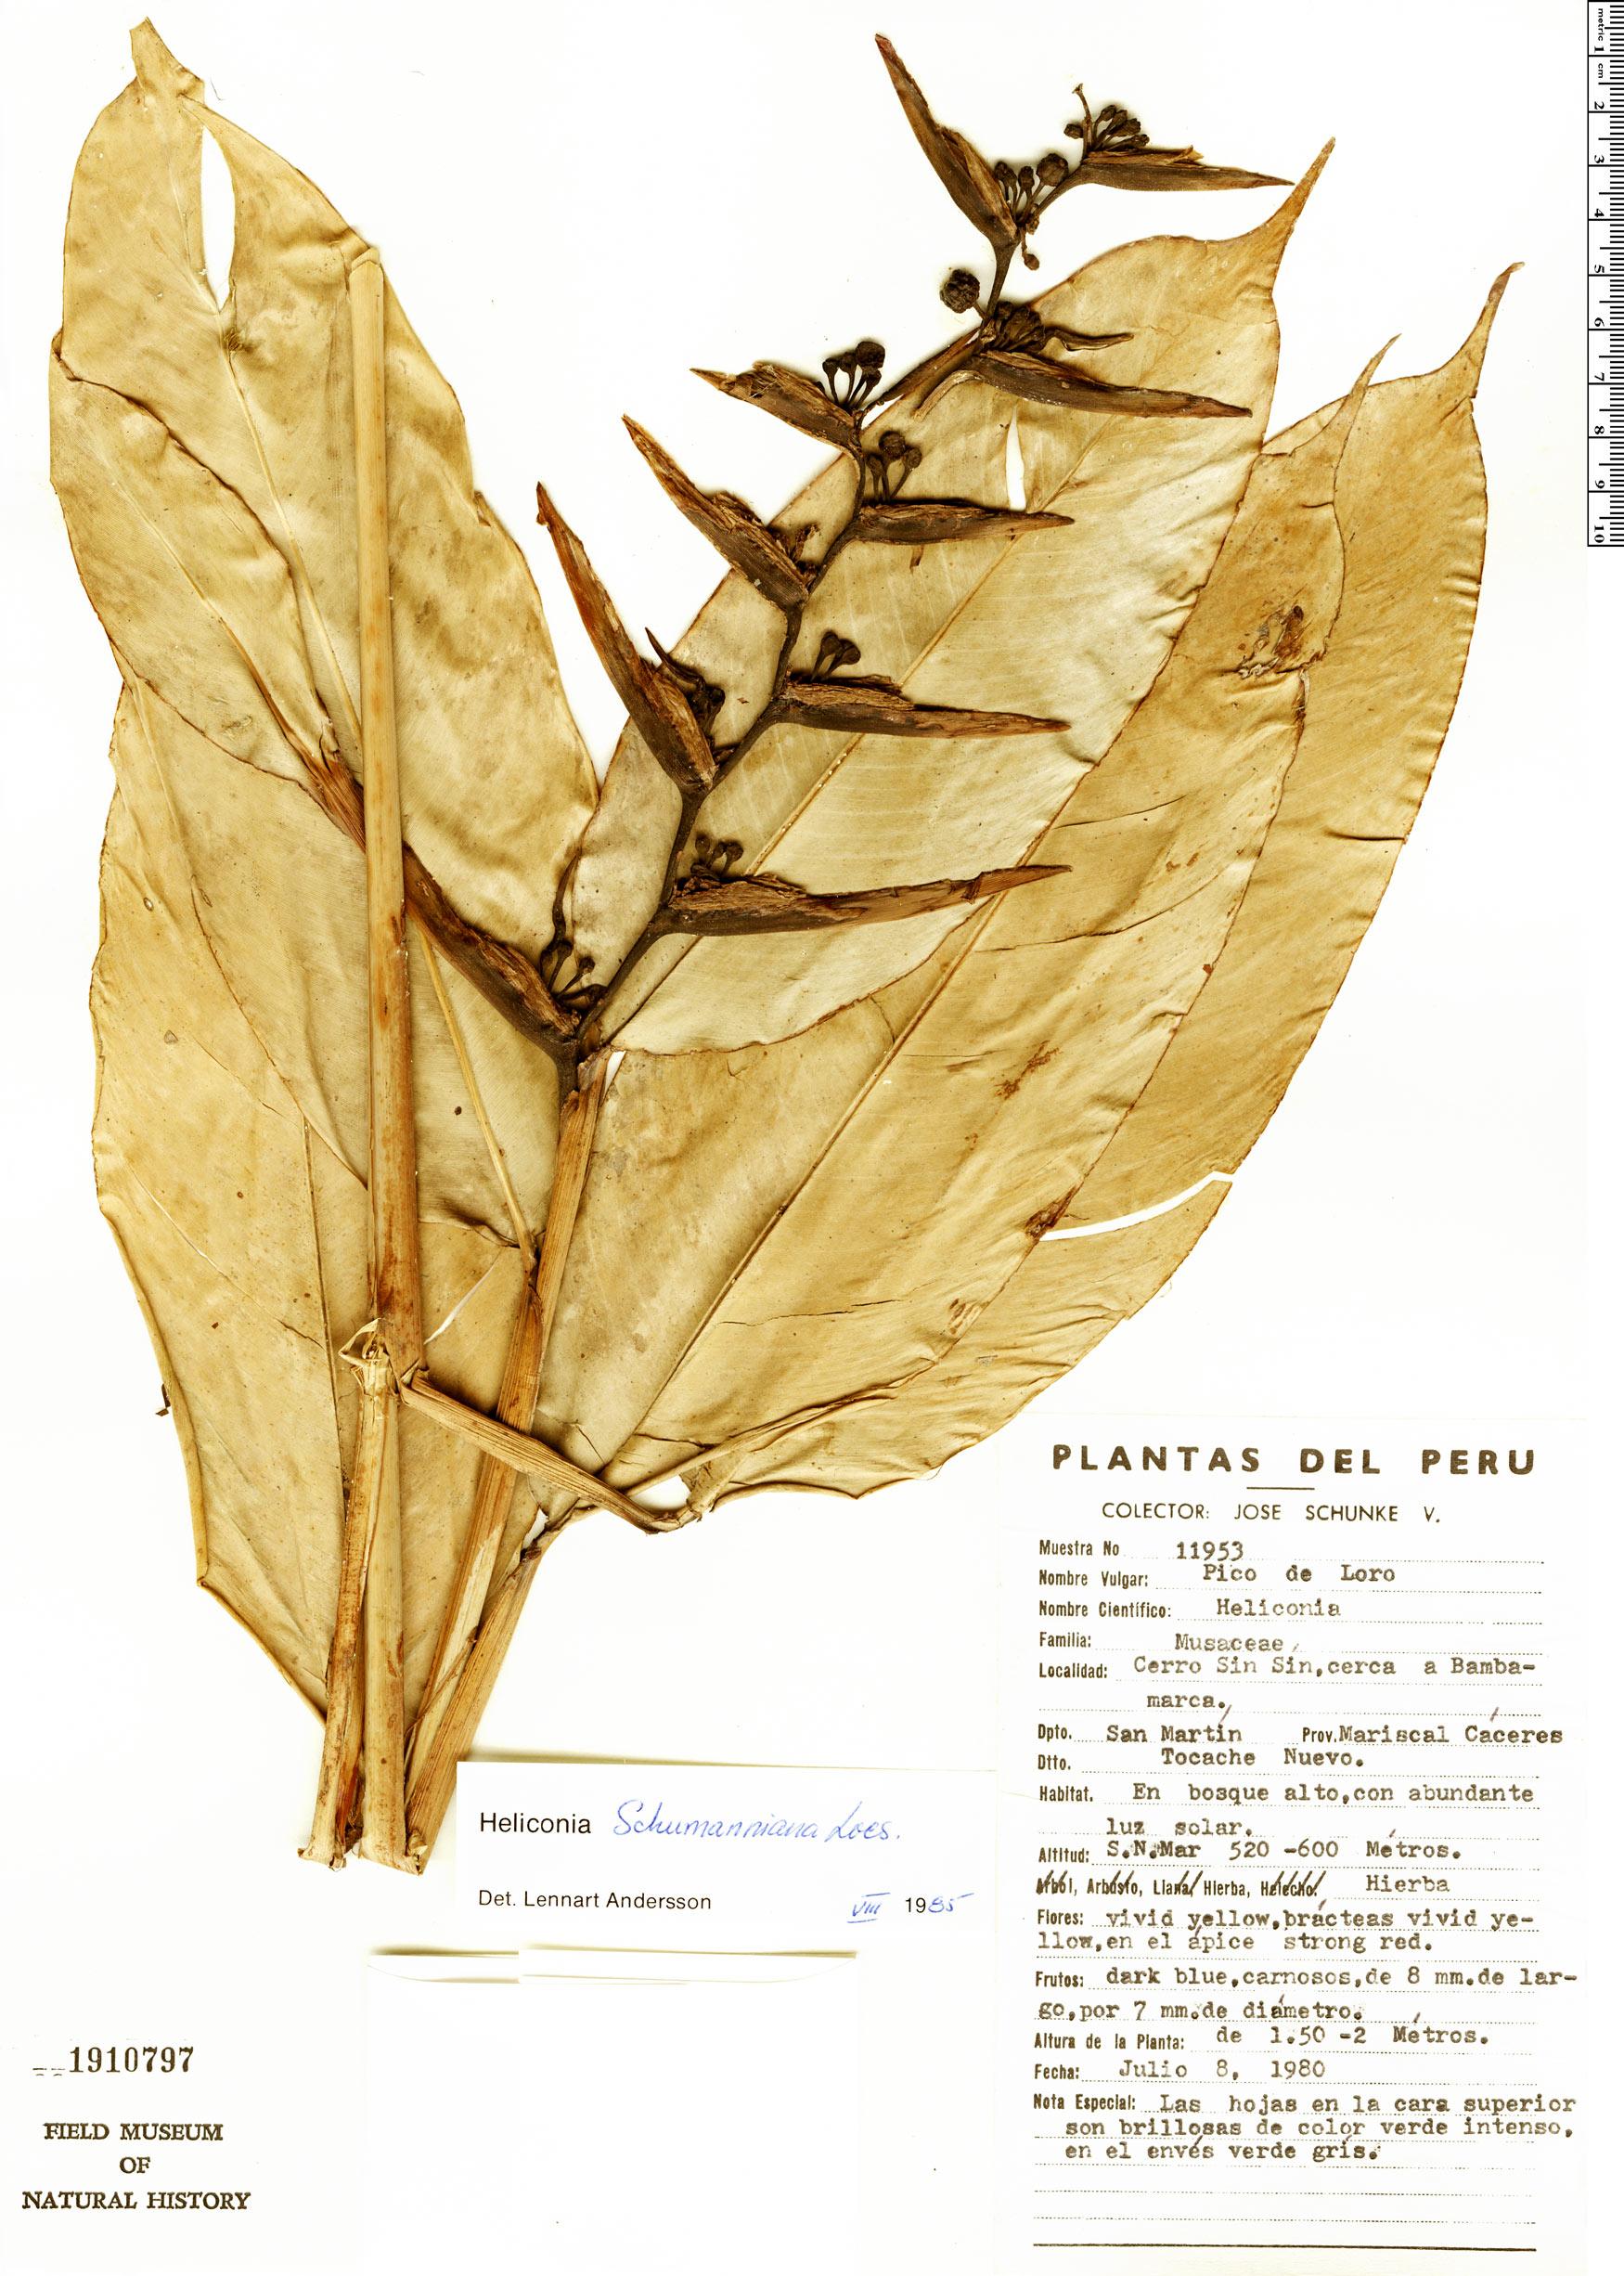 Specimen: Heliconia schumanniana